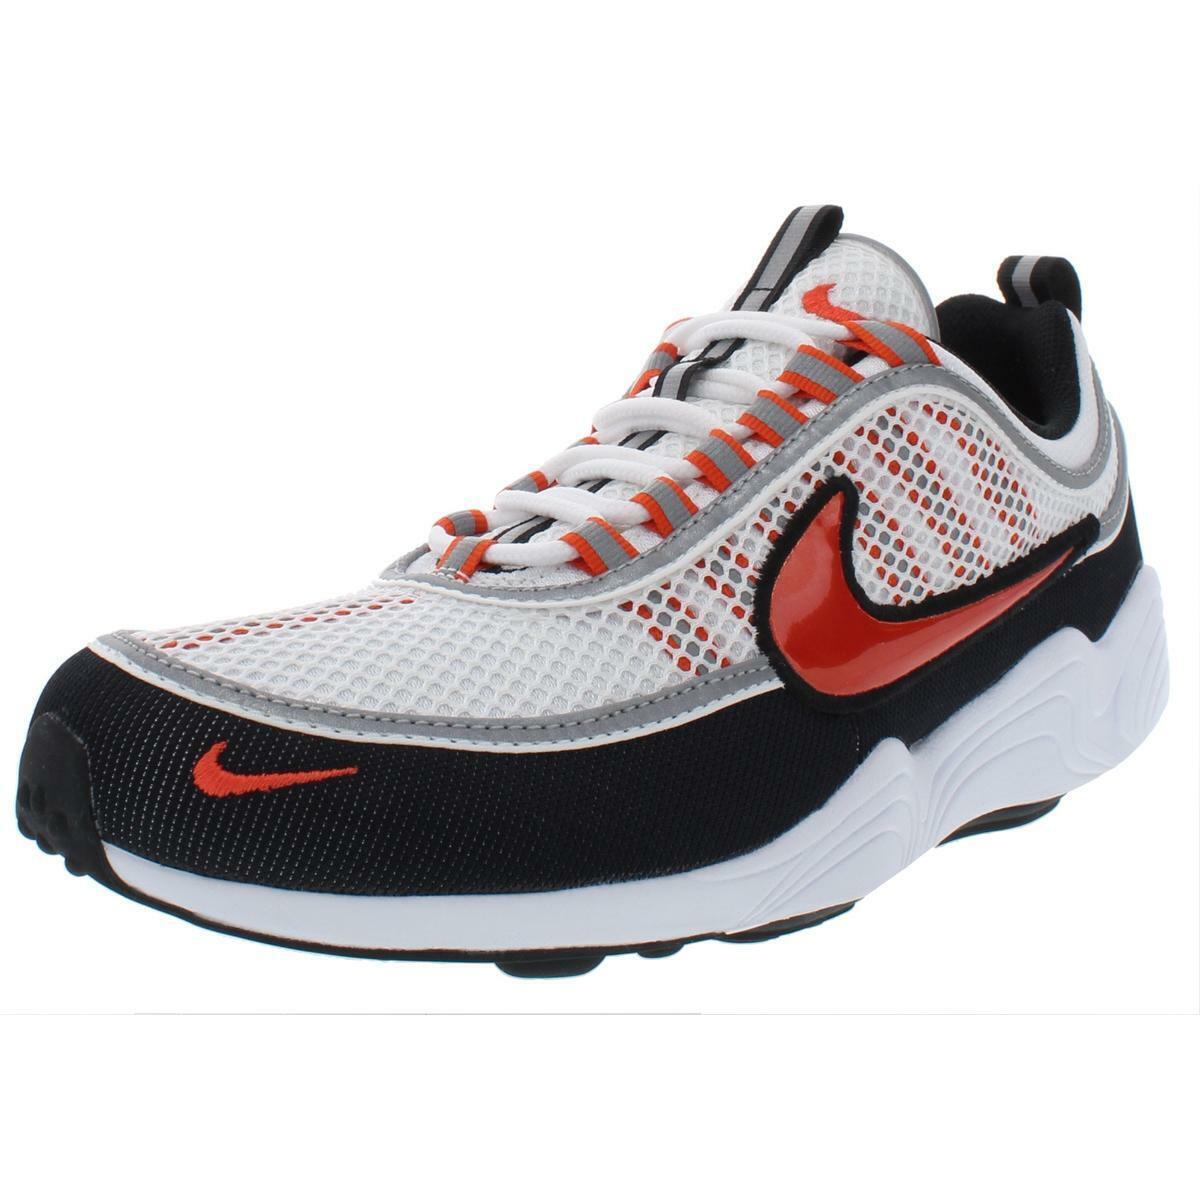 Nike Mens Air Zoom Spiridon 16 Mesh Running Athletic shoes Sneakers BHFO 3339